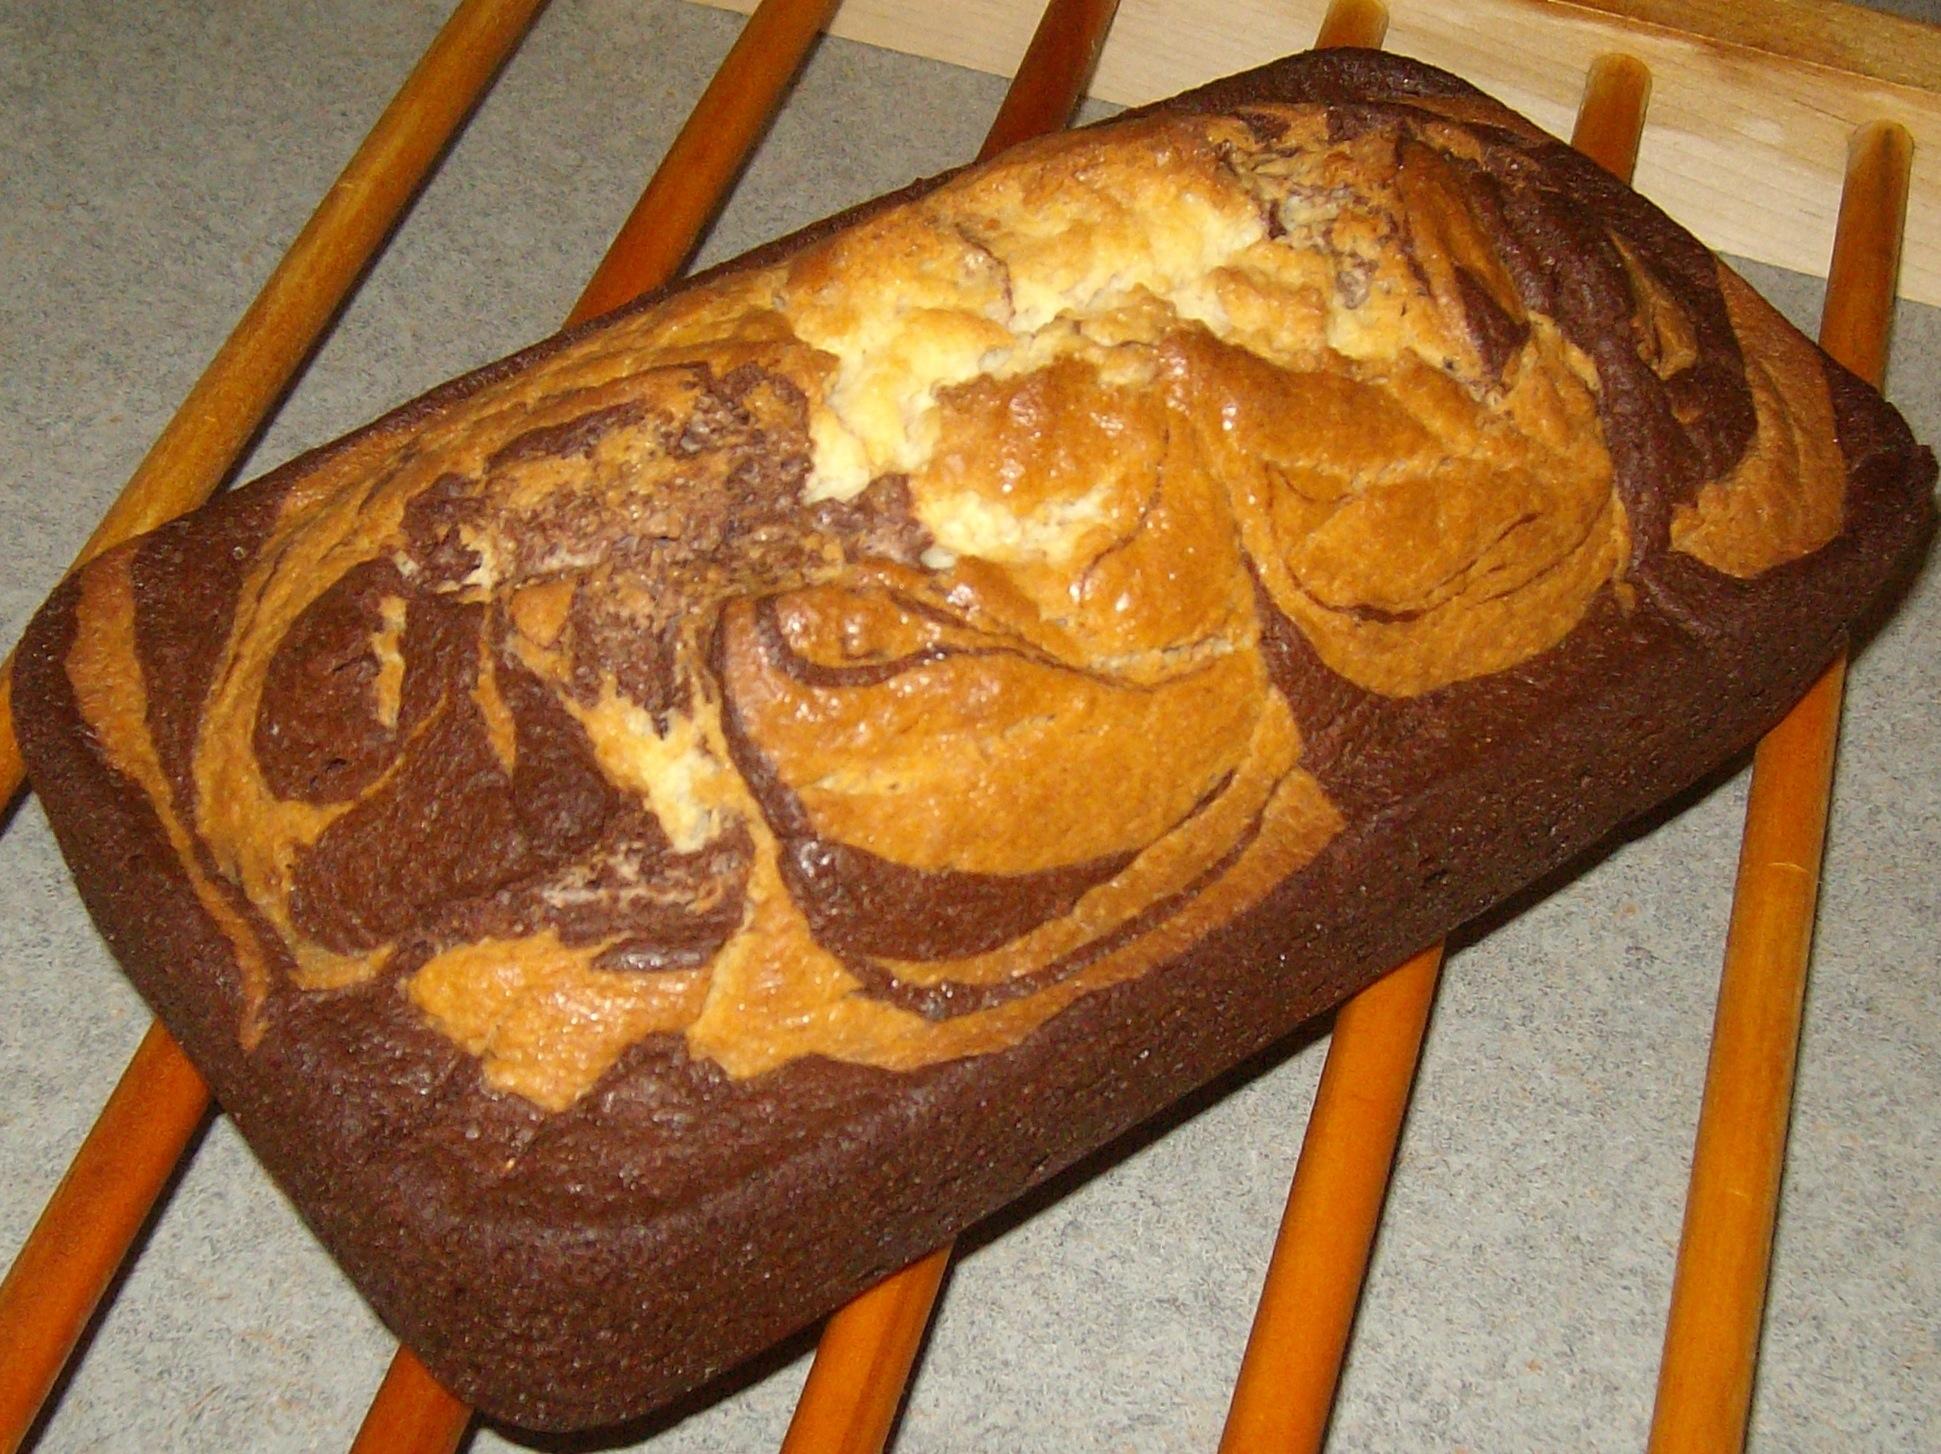 Chocolate White Chocolate Marble Amish Friendship Bread by Kira Endicott   friendshipbreadkitchen.com